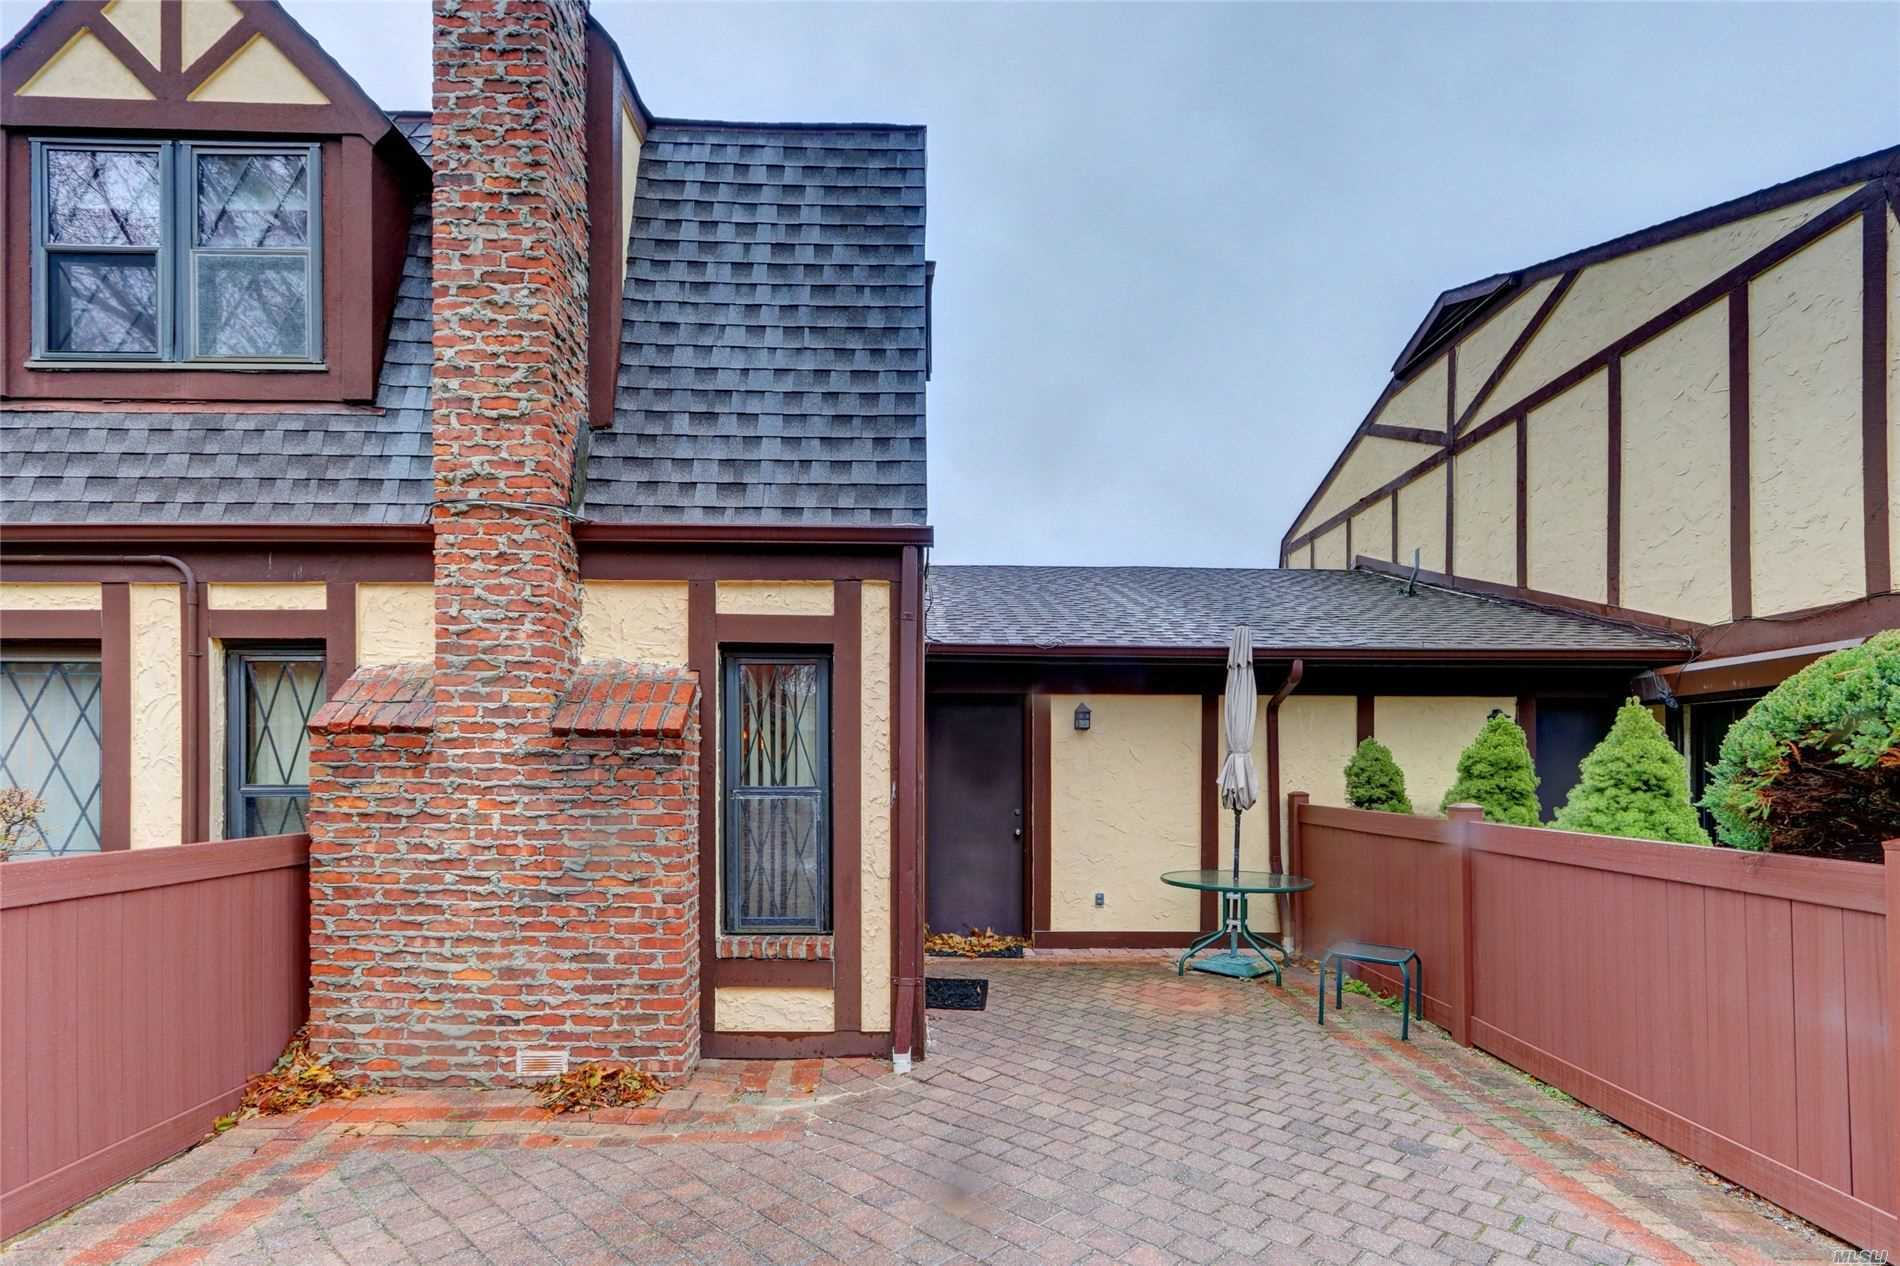 Property for sale at 28 Summerfield Court, Deer Park NY 11729, Deer Park,  New York 11729